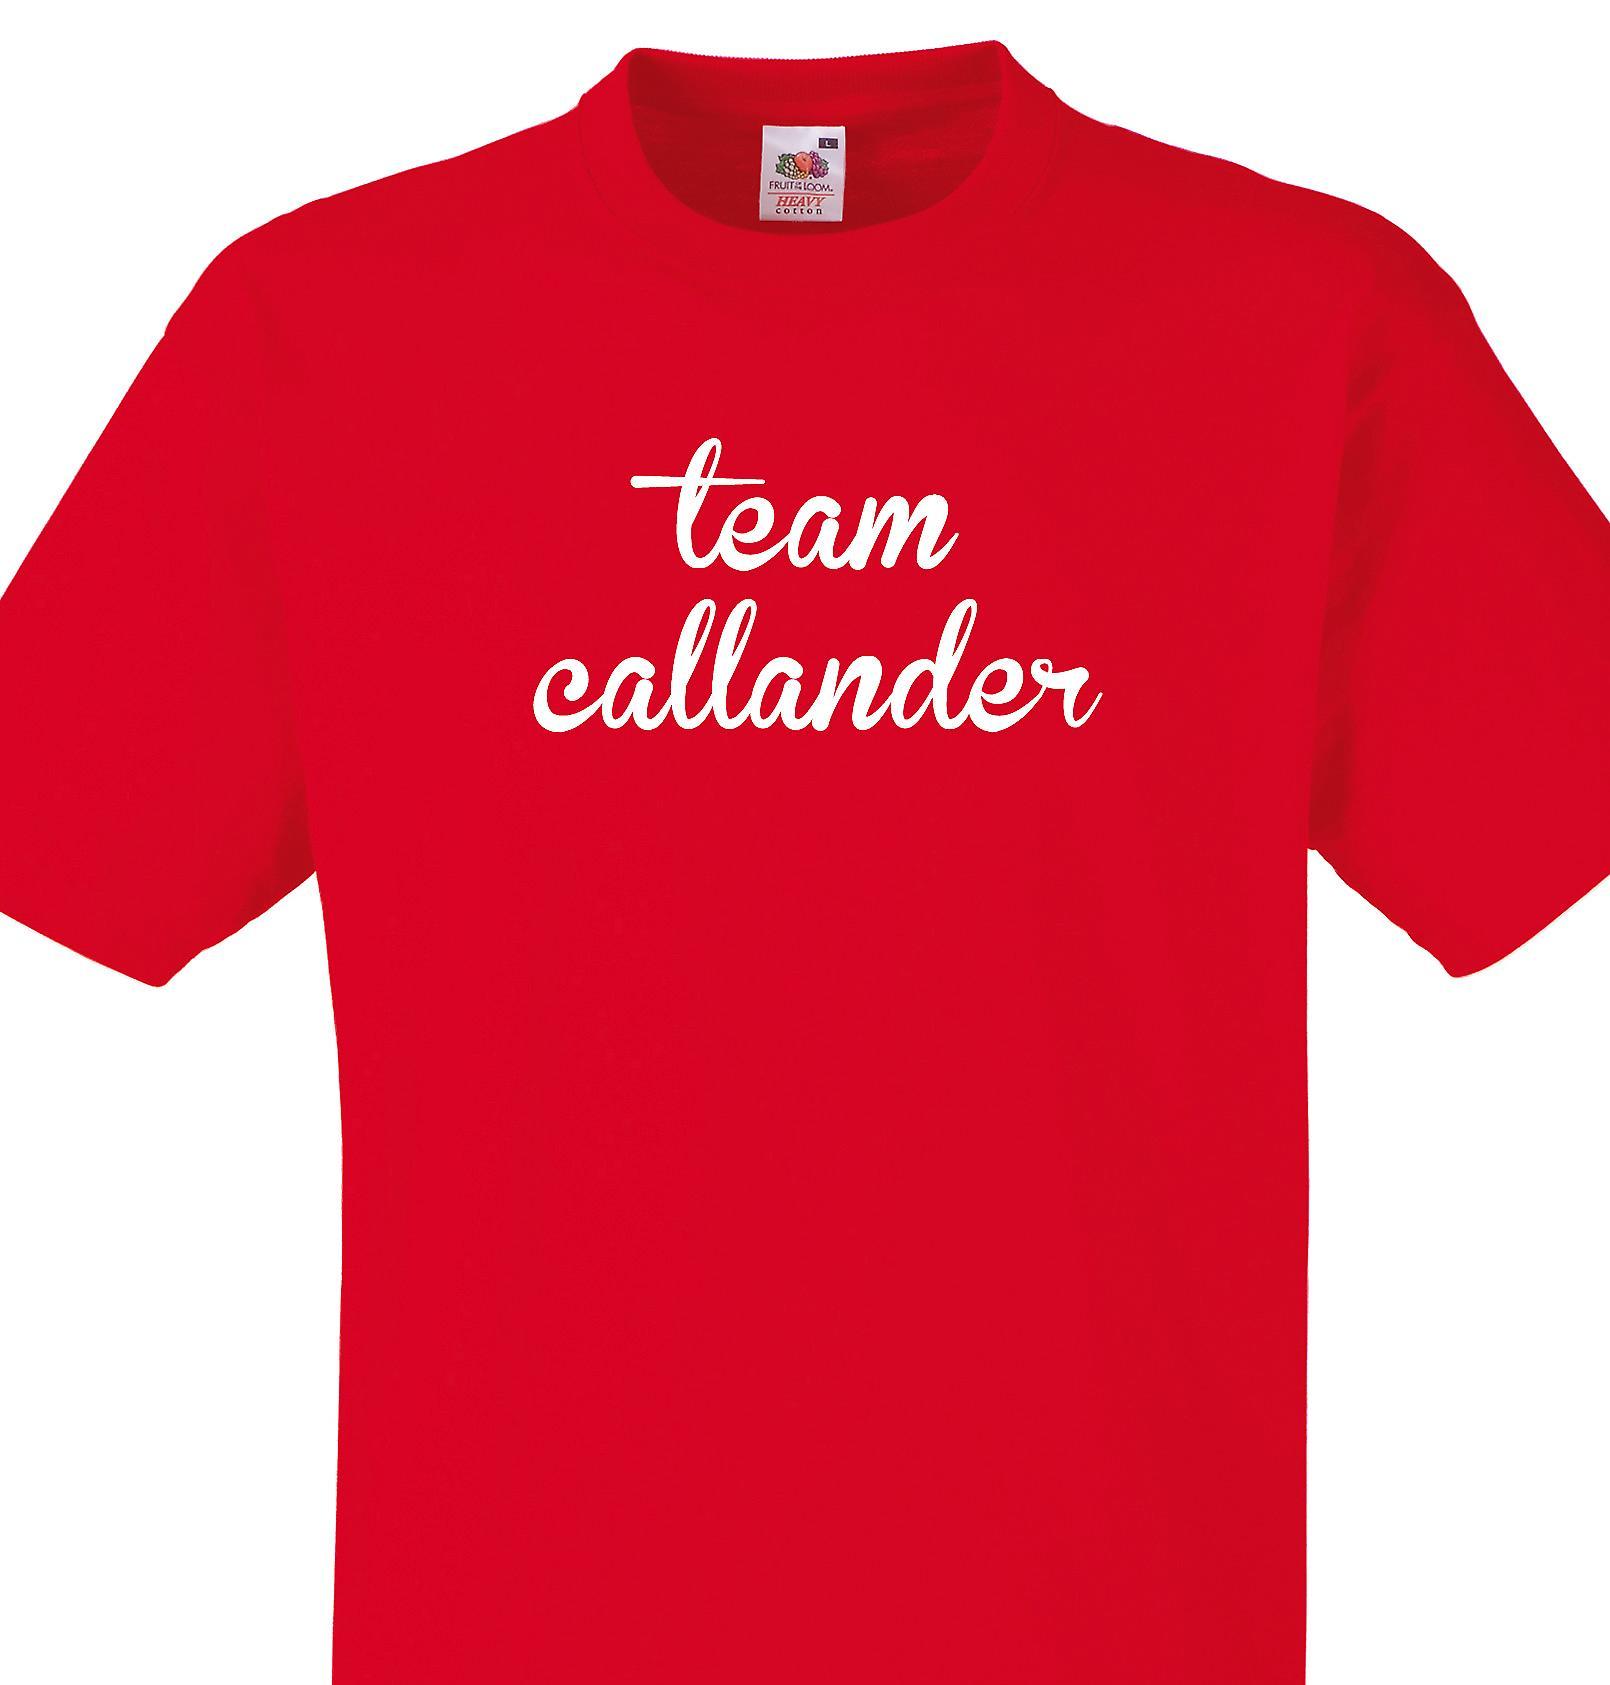 Team Callander Red T shirt